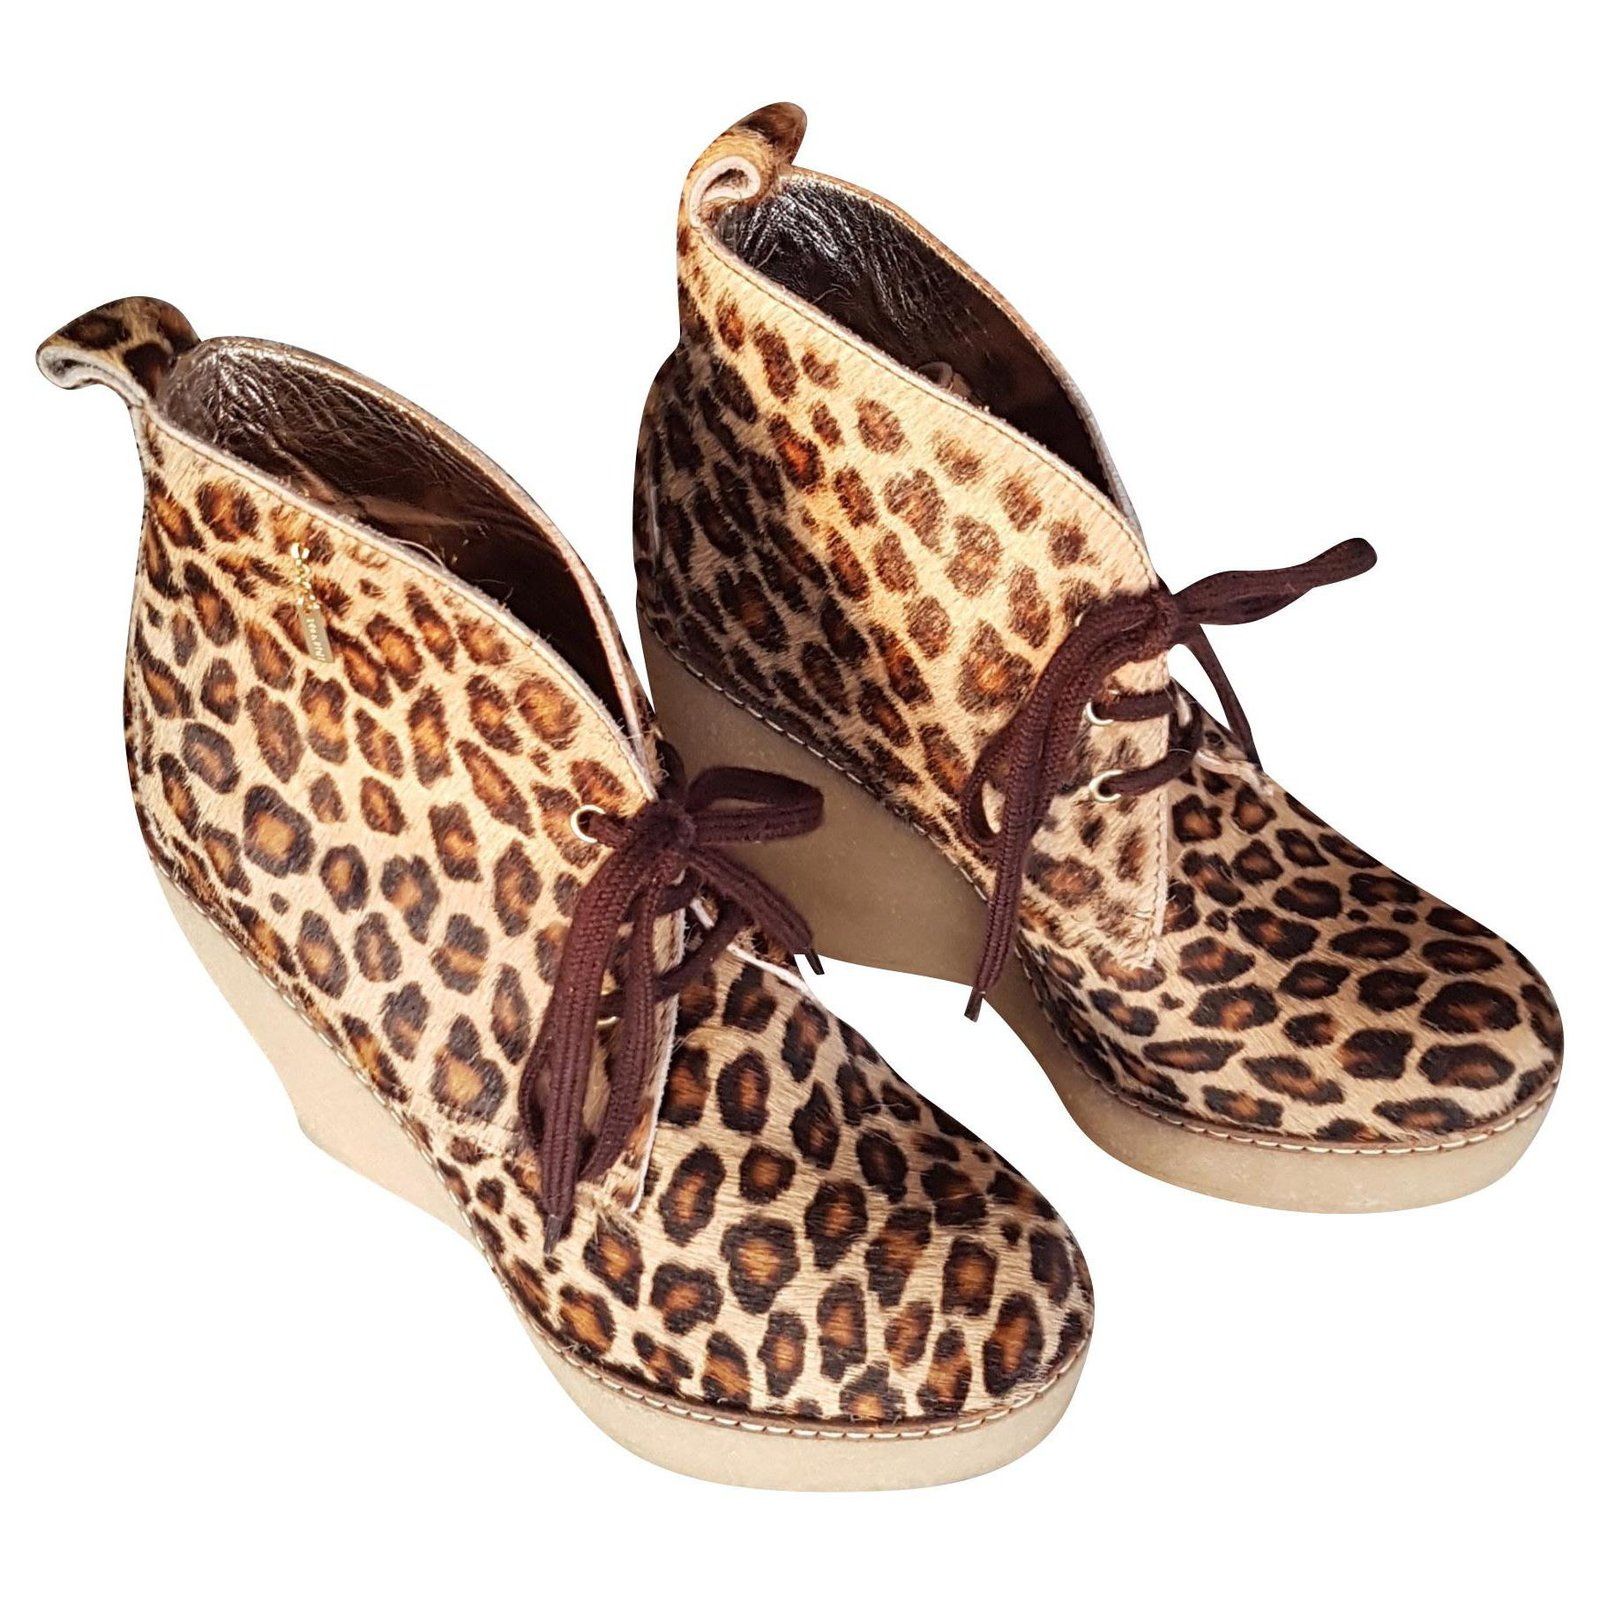 Boots Serafini talons compensés.